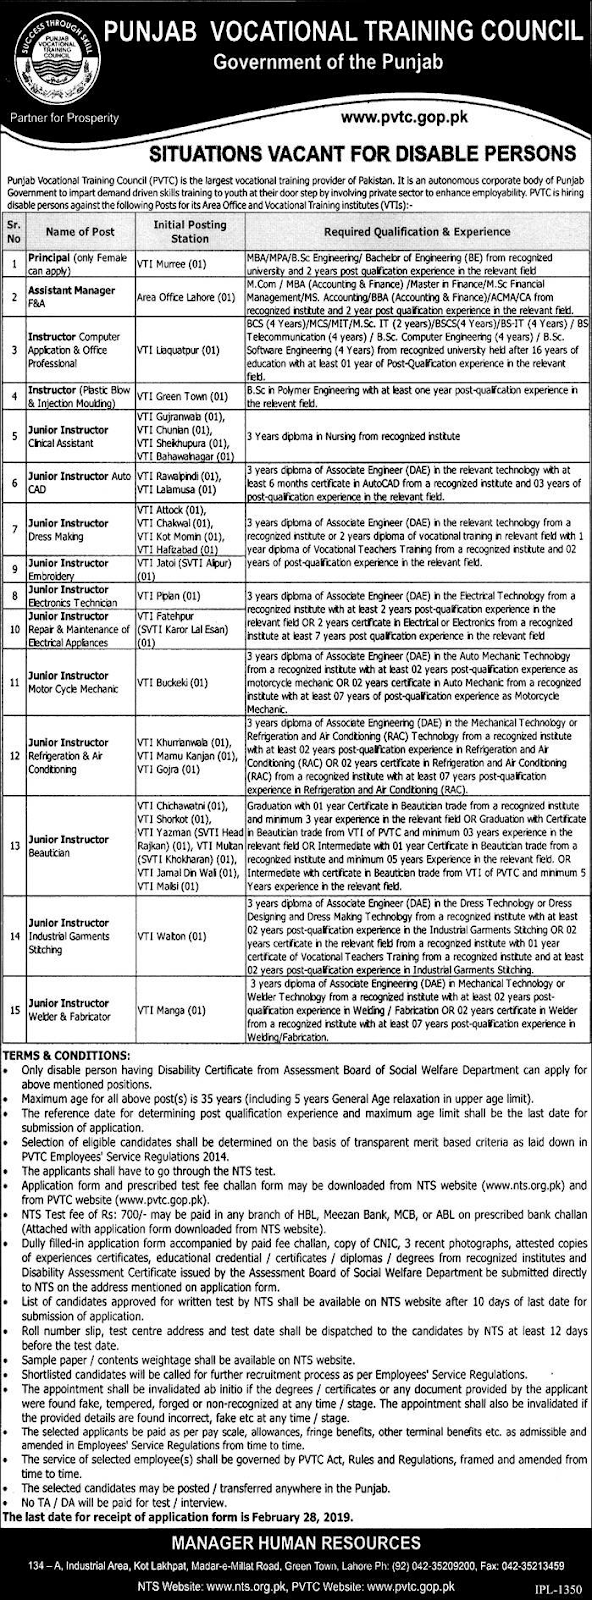 Advertisement for PVTC Jobs